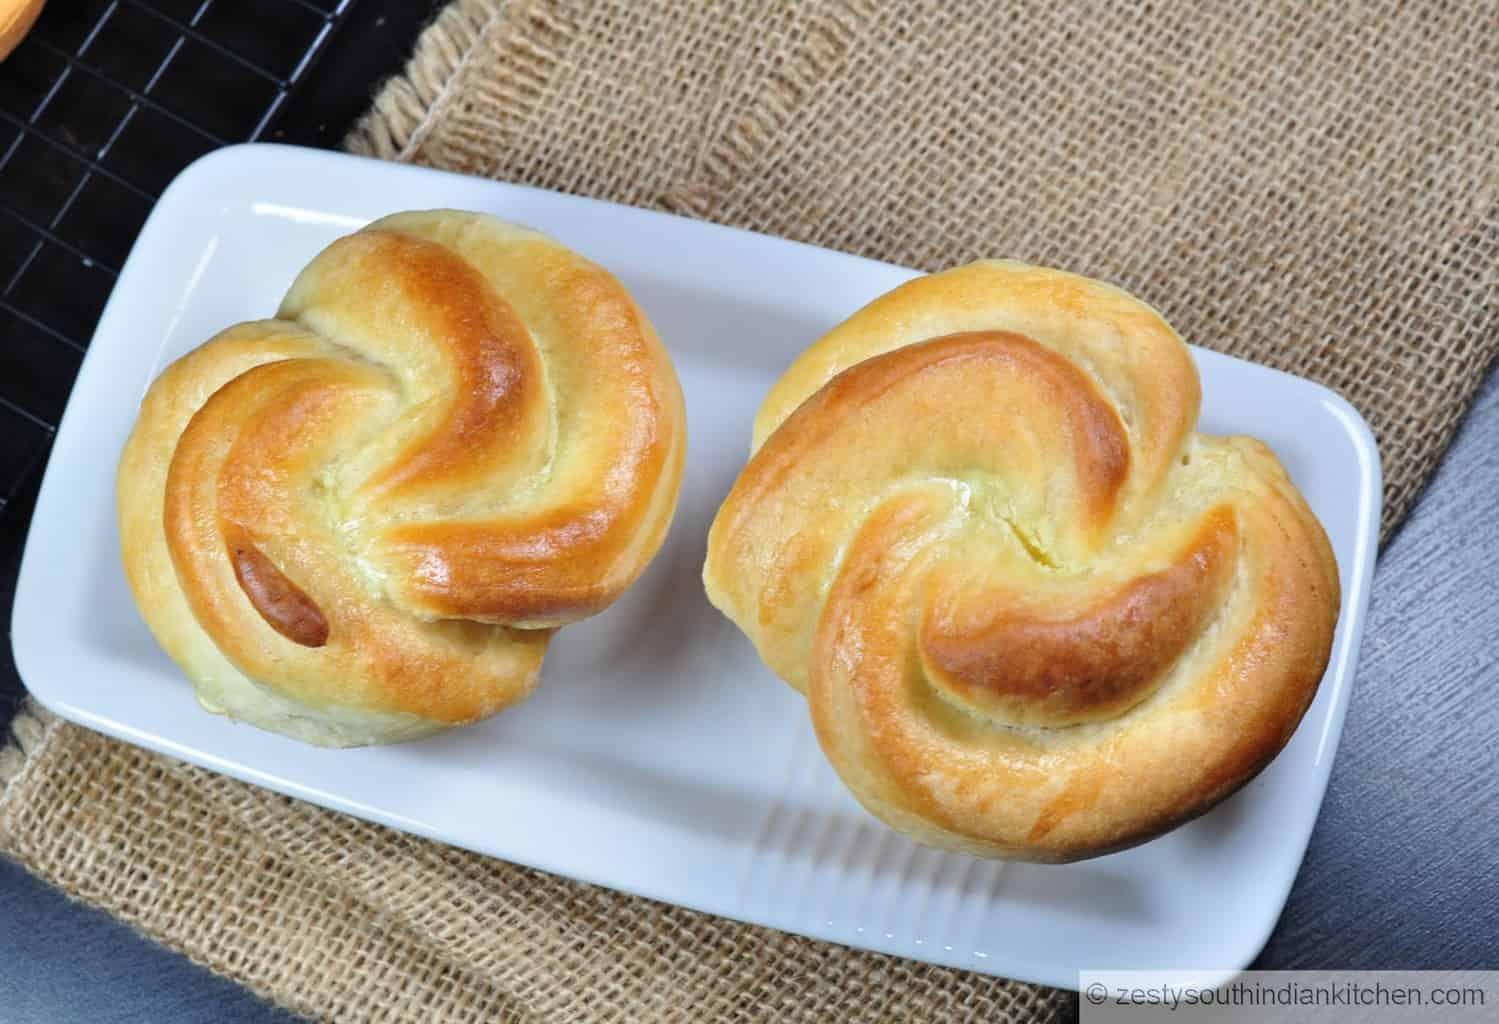 "<img src=""https://cdn.shortpixel.ai/client/q_glossy,ret_img,w_1600,h_1093/rose shaped dinner rolls.jpg"" alt="" rose shaped dinner rolls"">"